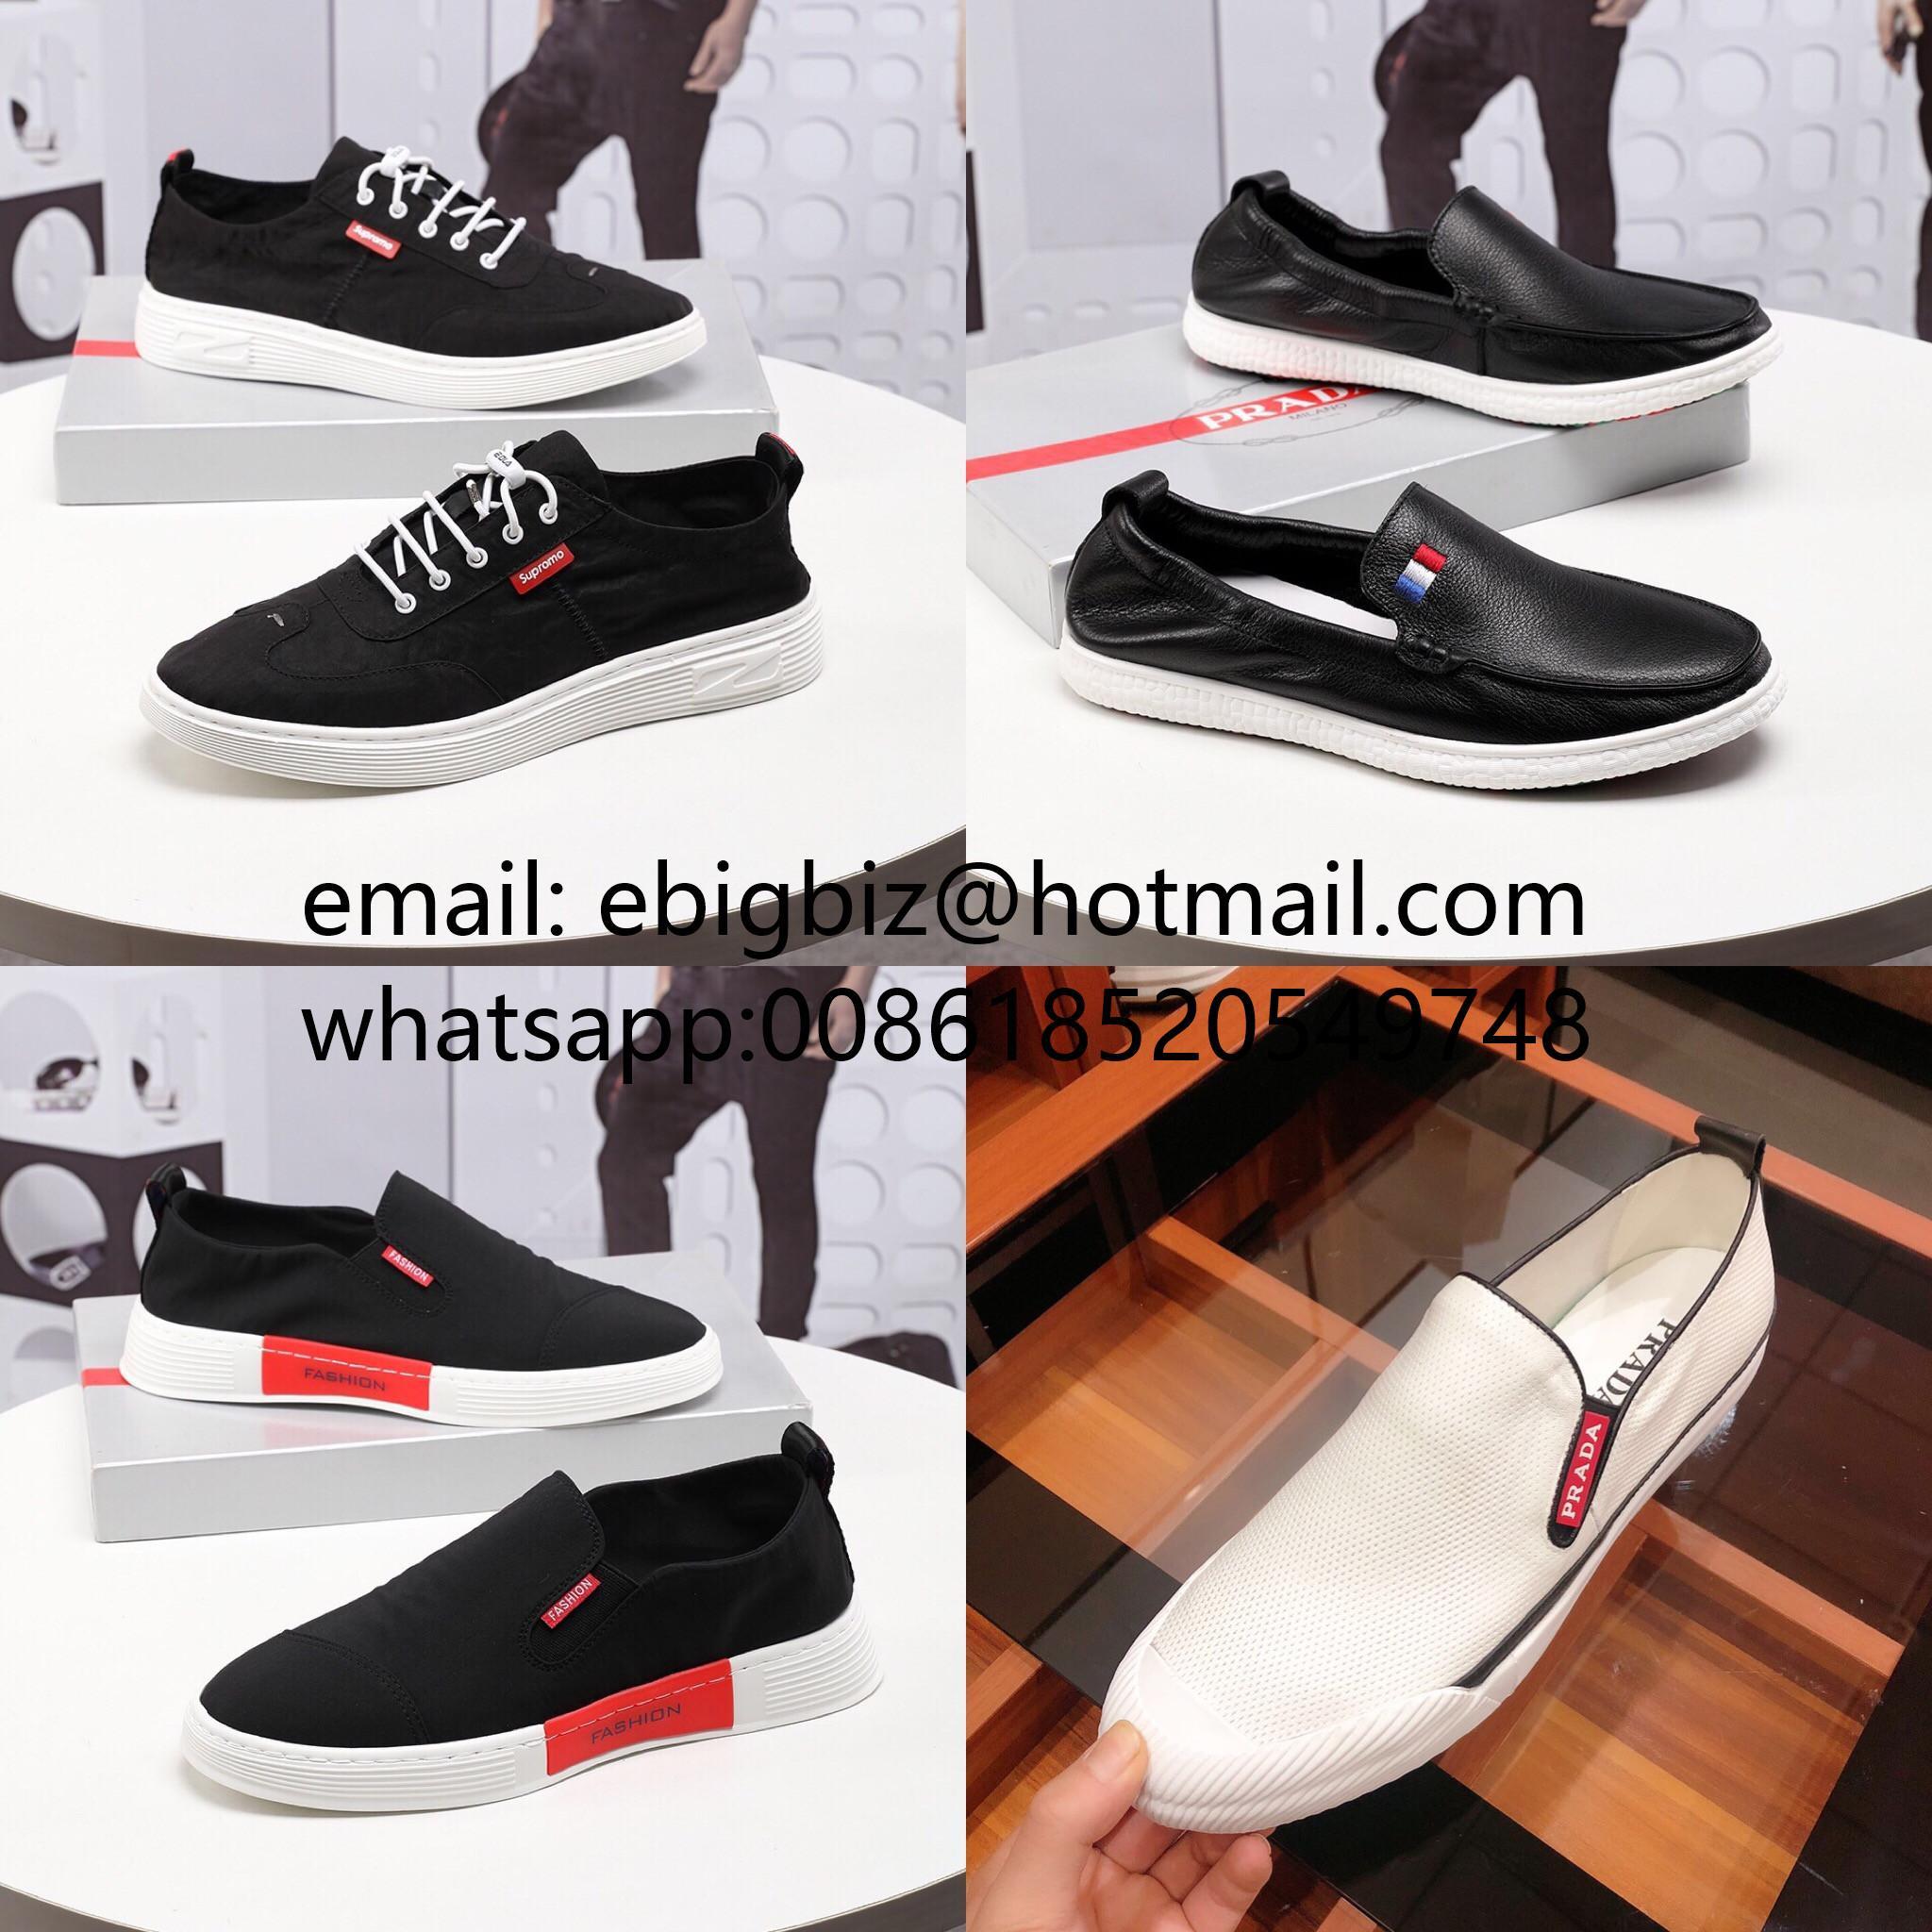 Cheap Prada shoes men Replica Prada shoes on sale Prada sneakers for men  3